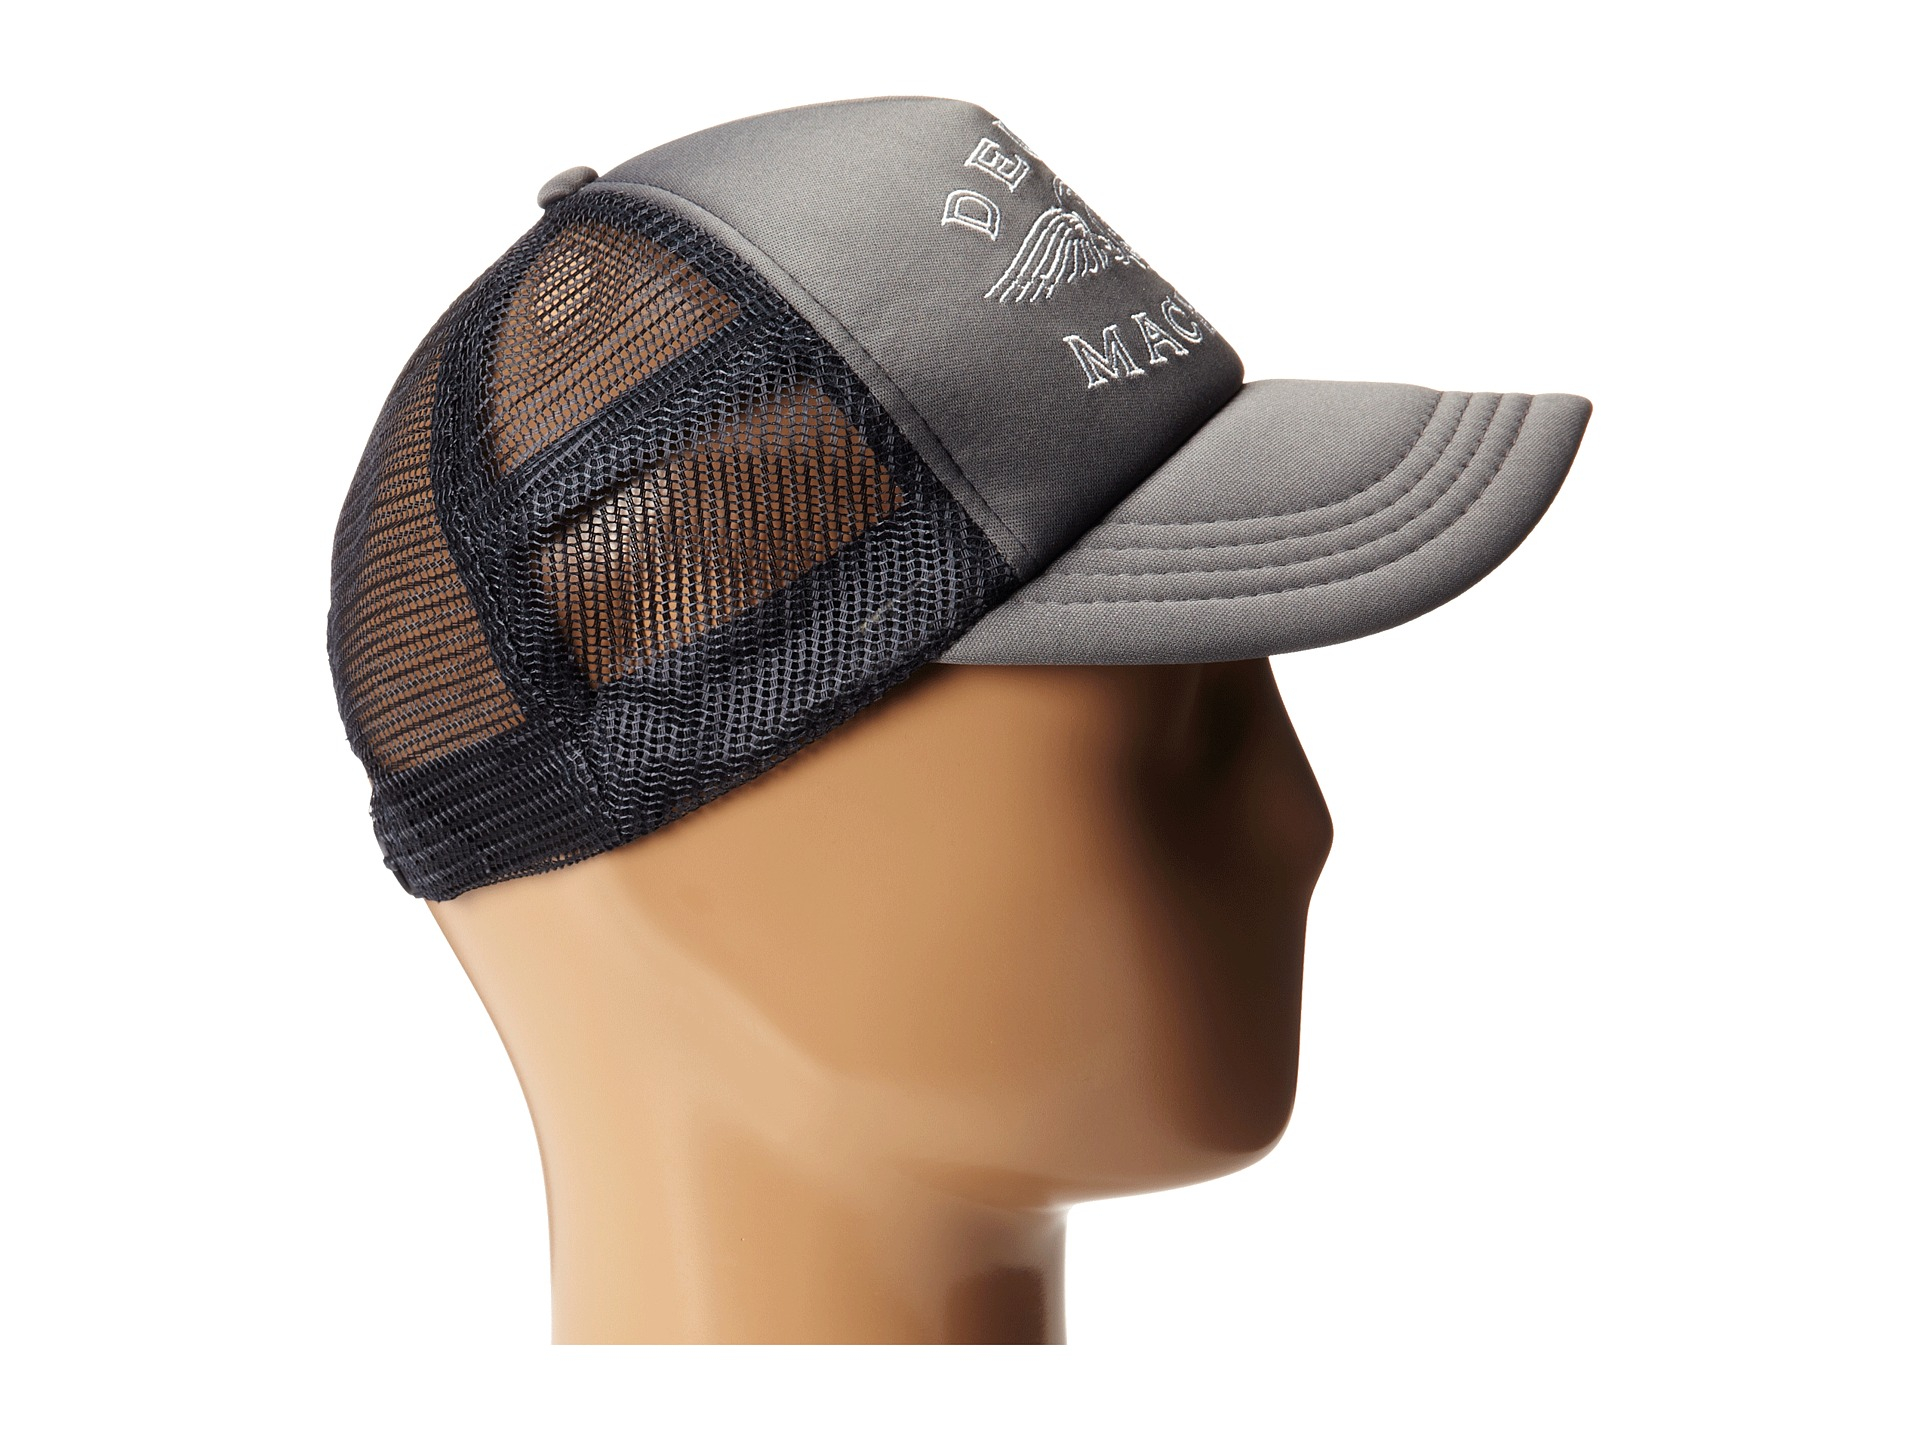 lyst deus ex machina curtis trucker cap in black for men. Black Bedroom Furniture Sets. Home Design Ideas